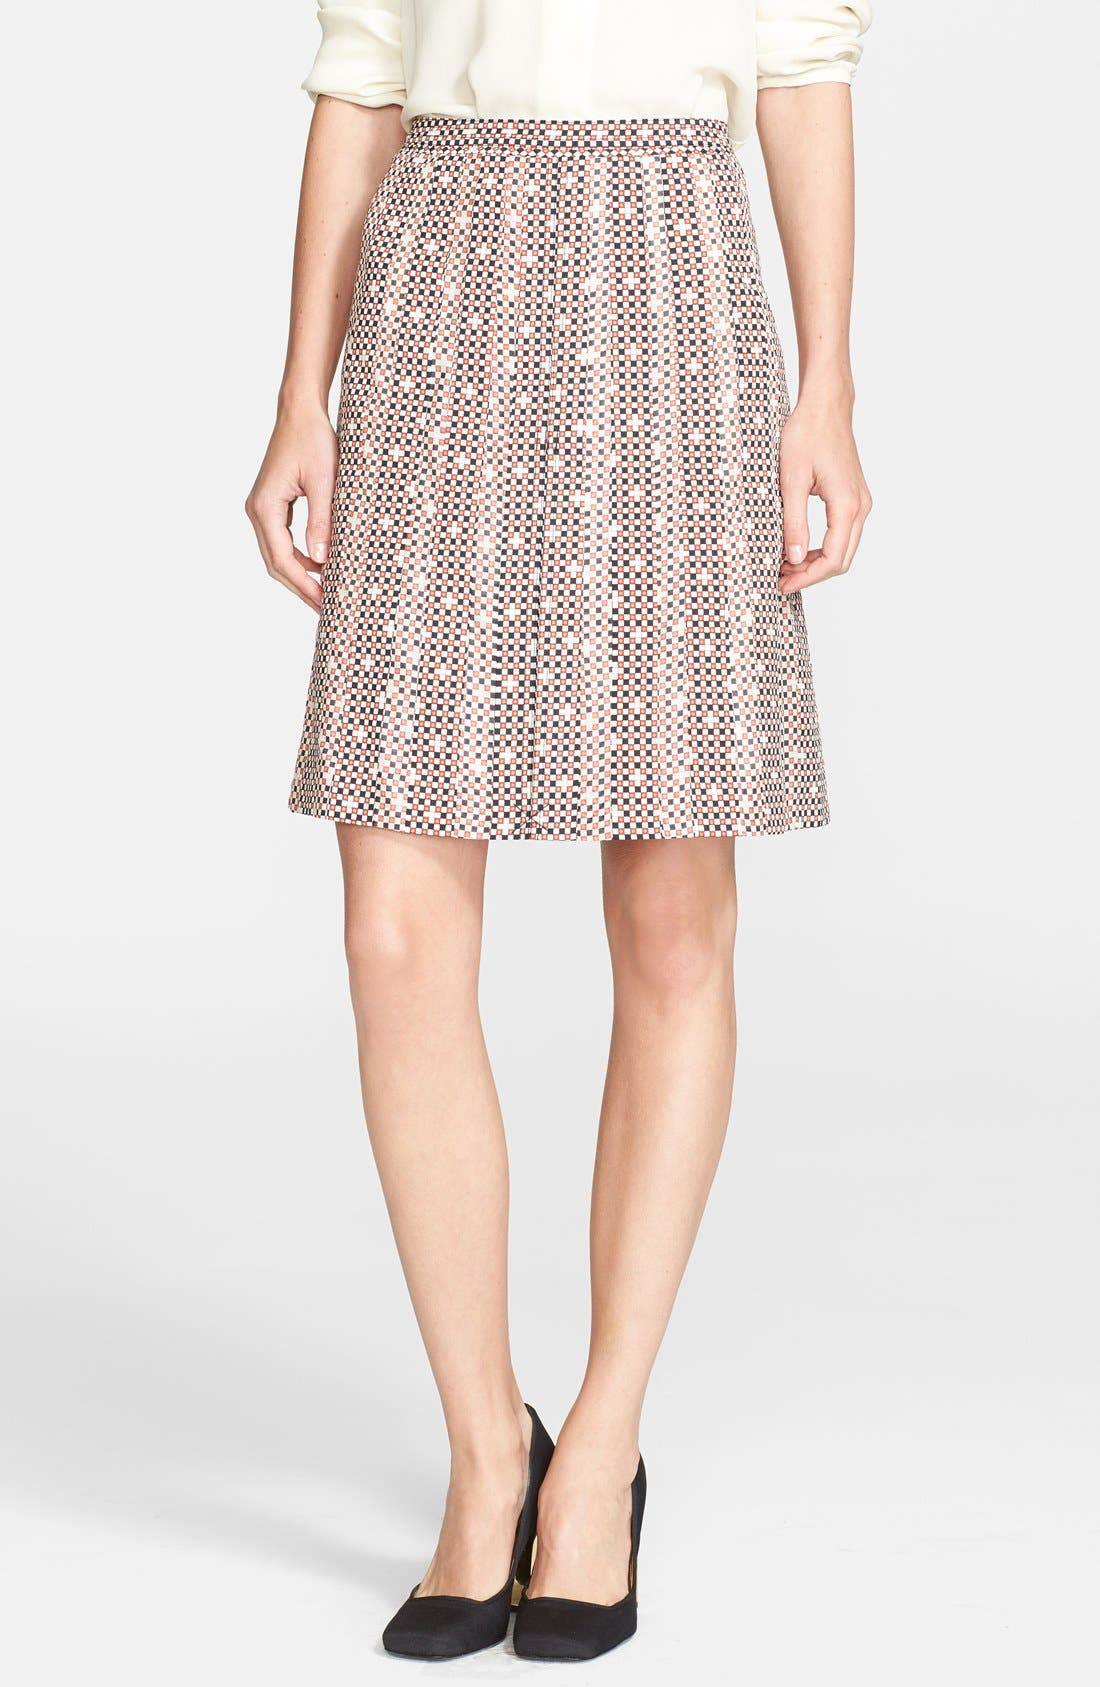 Main Image - Tory Burch 'Floria' Print Stretch Silk Skirt